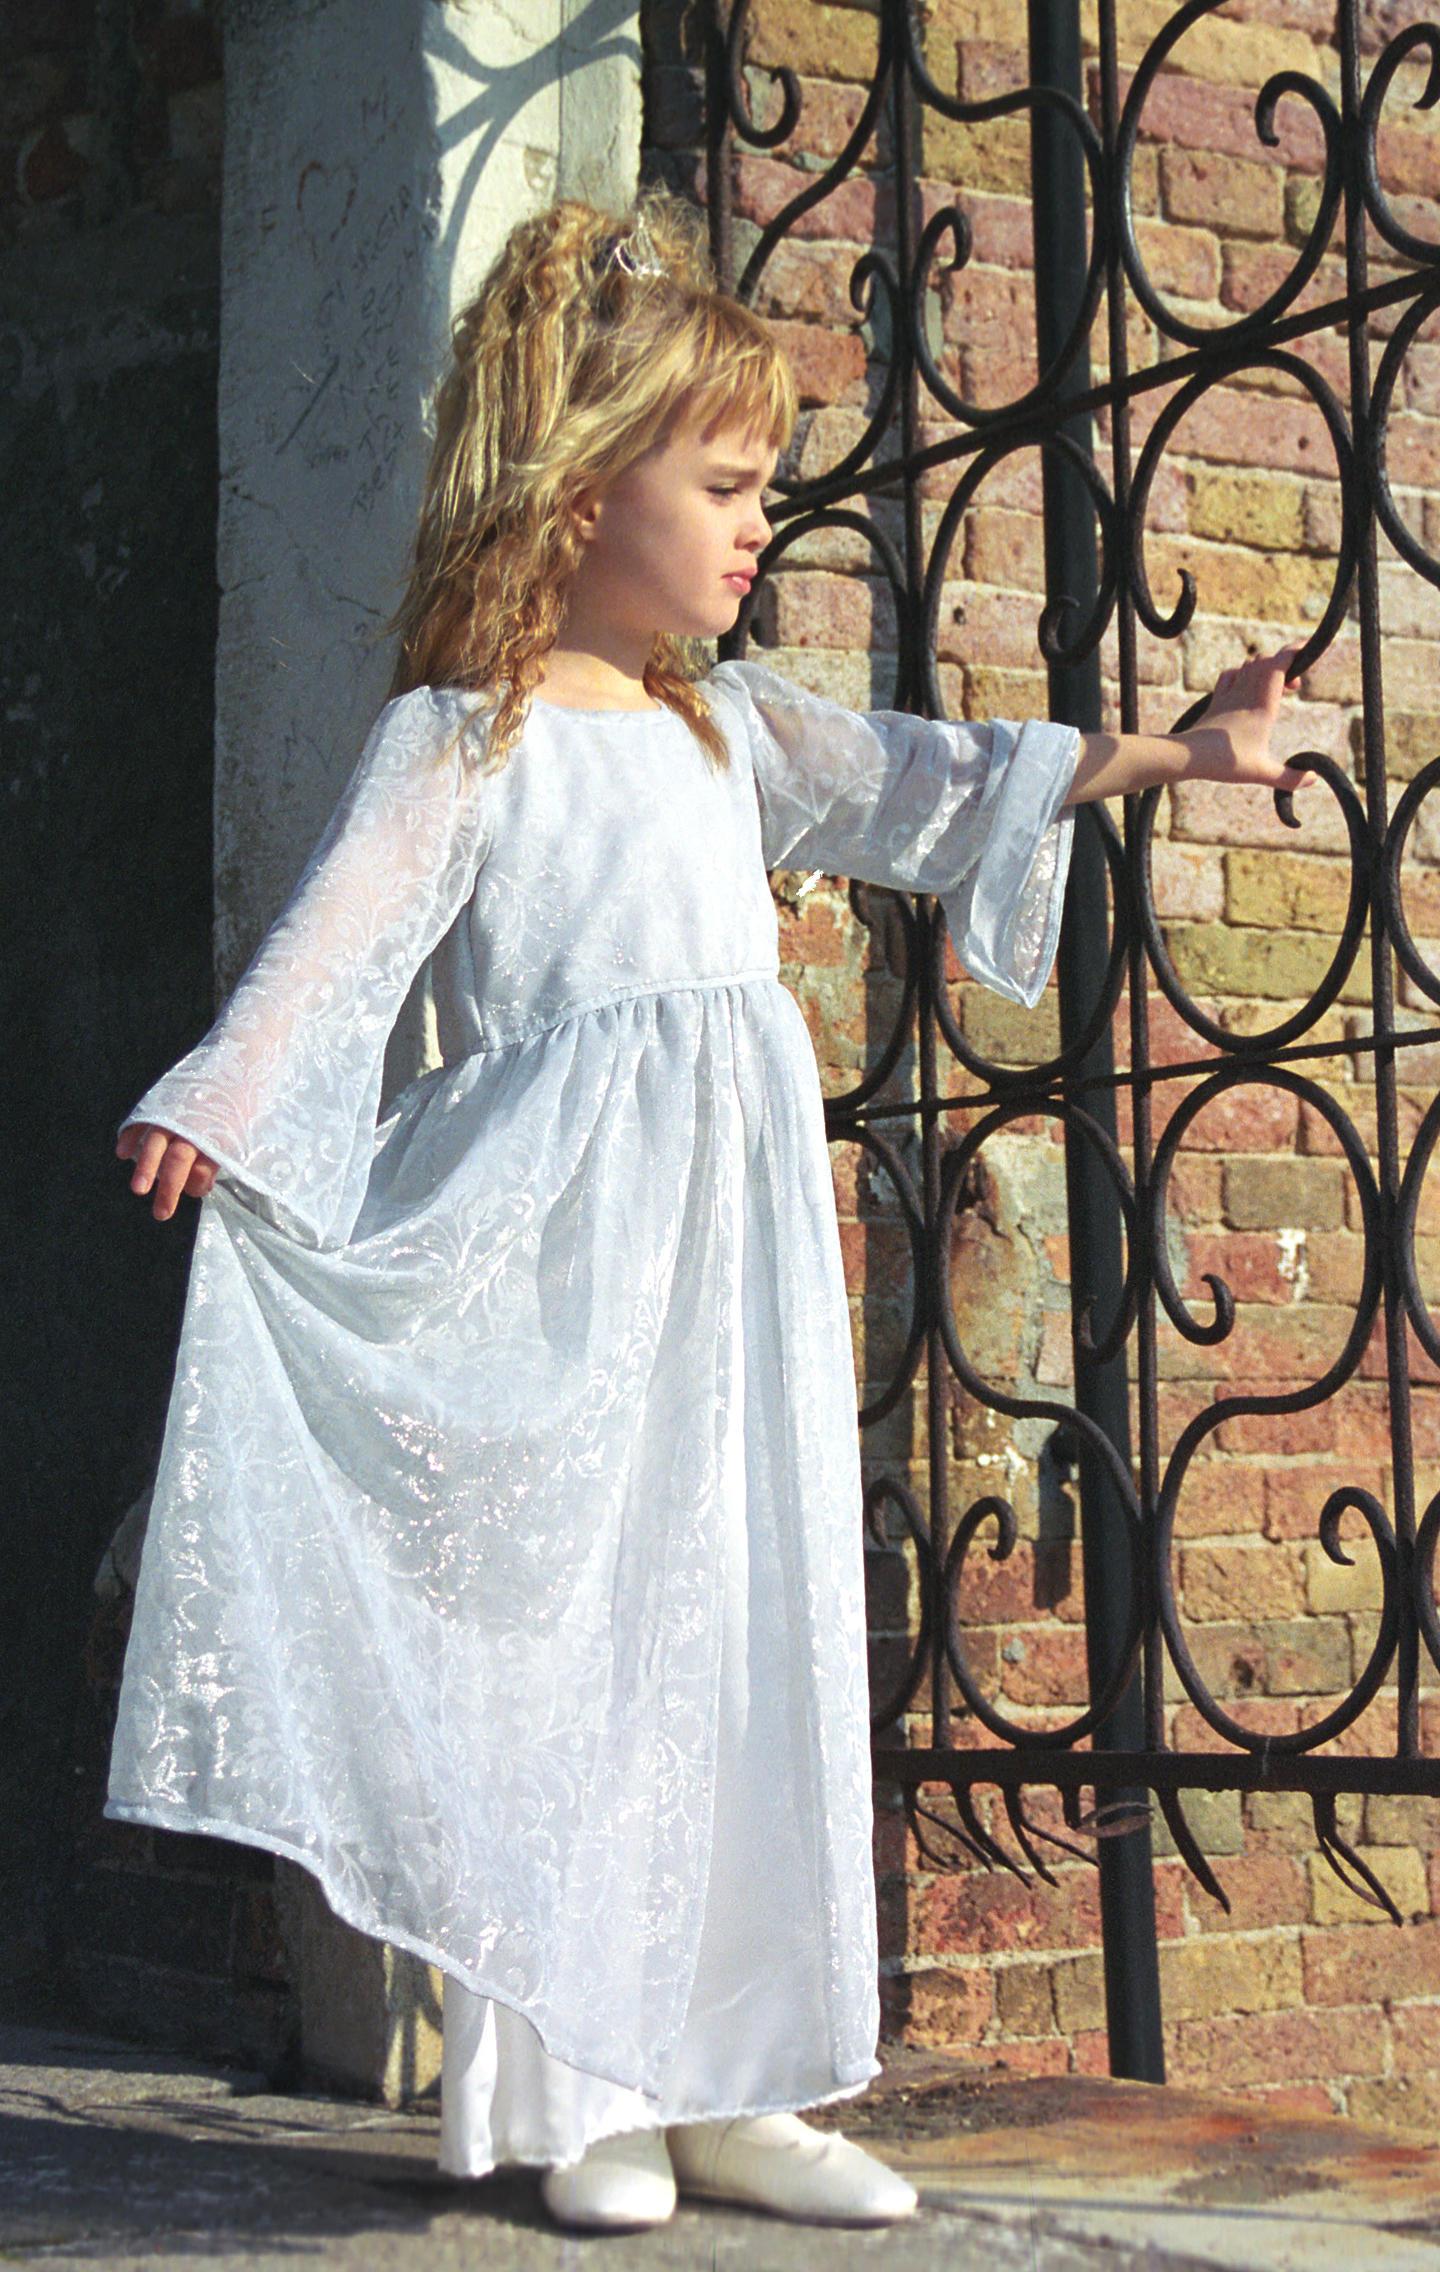 Princess by Rivendell-PhotoStock